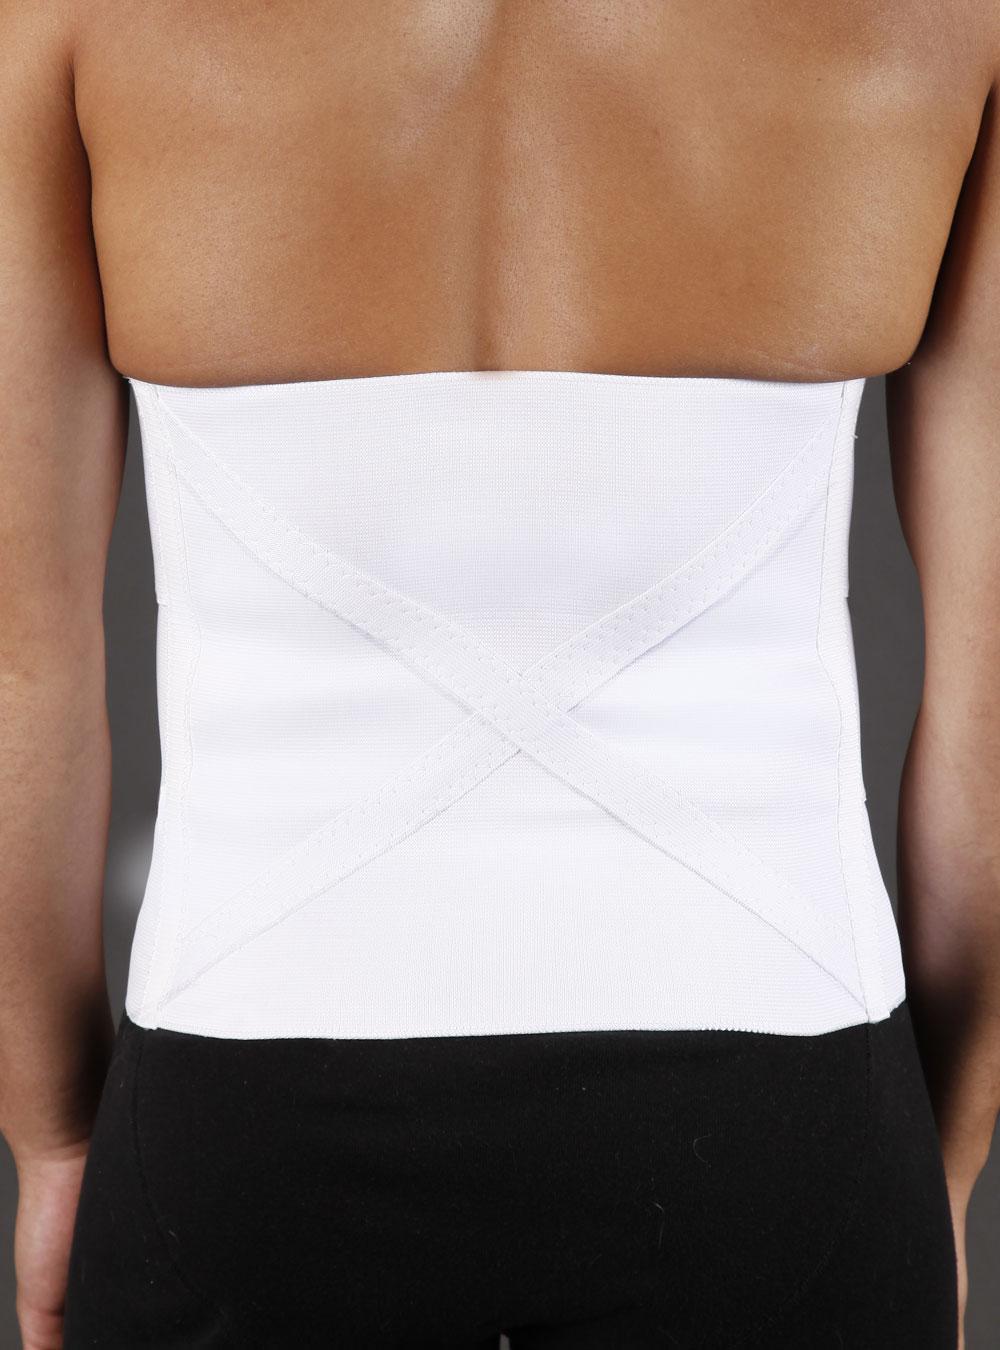 3-8004 waist binder back